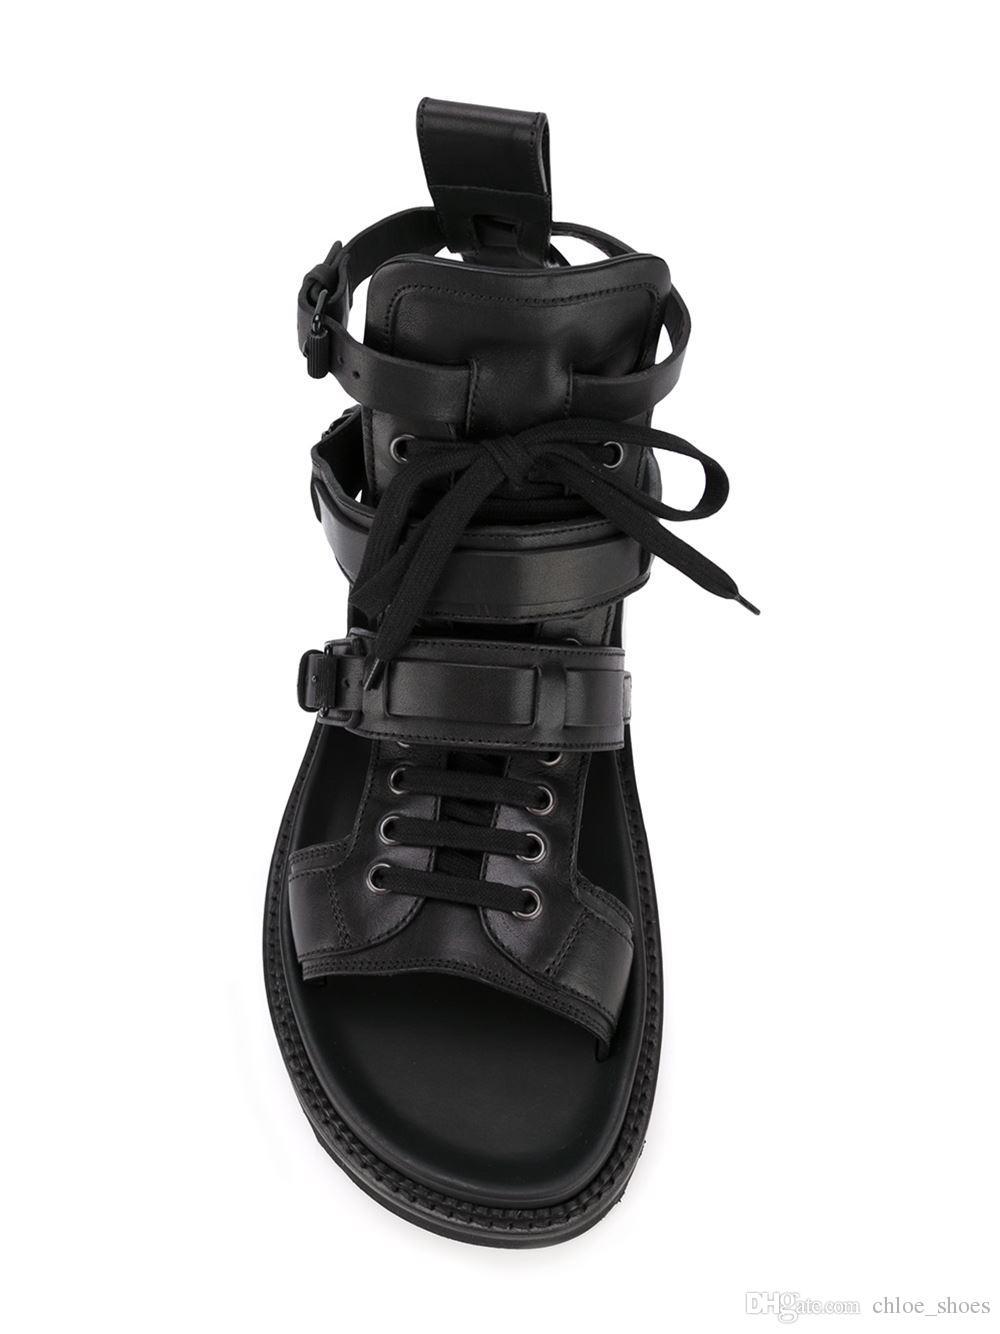 Alta top de Couro Genuíno Roma Gladiadores para homens Lace up Strappy Sandálias Pretas Moda Sapatos Casuais Hombre Sapatos 2017